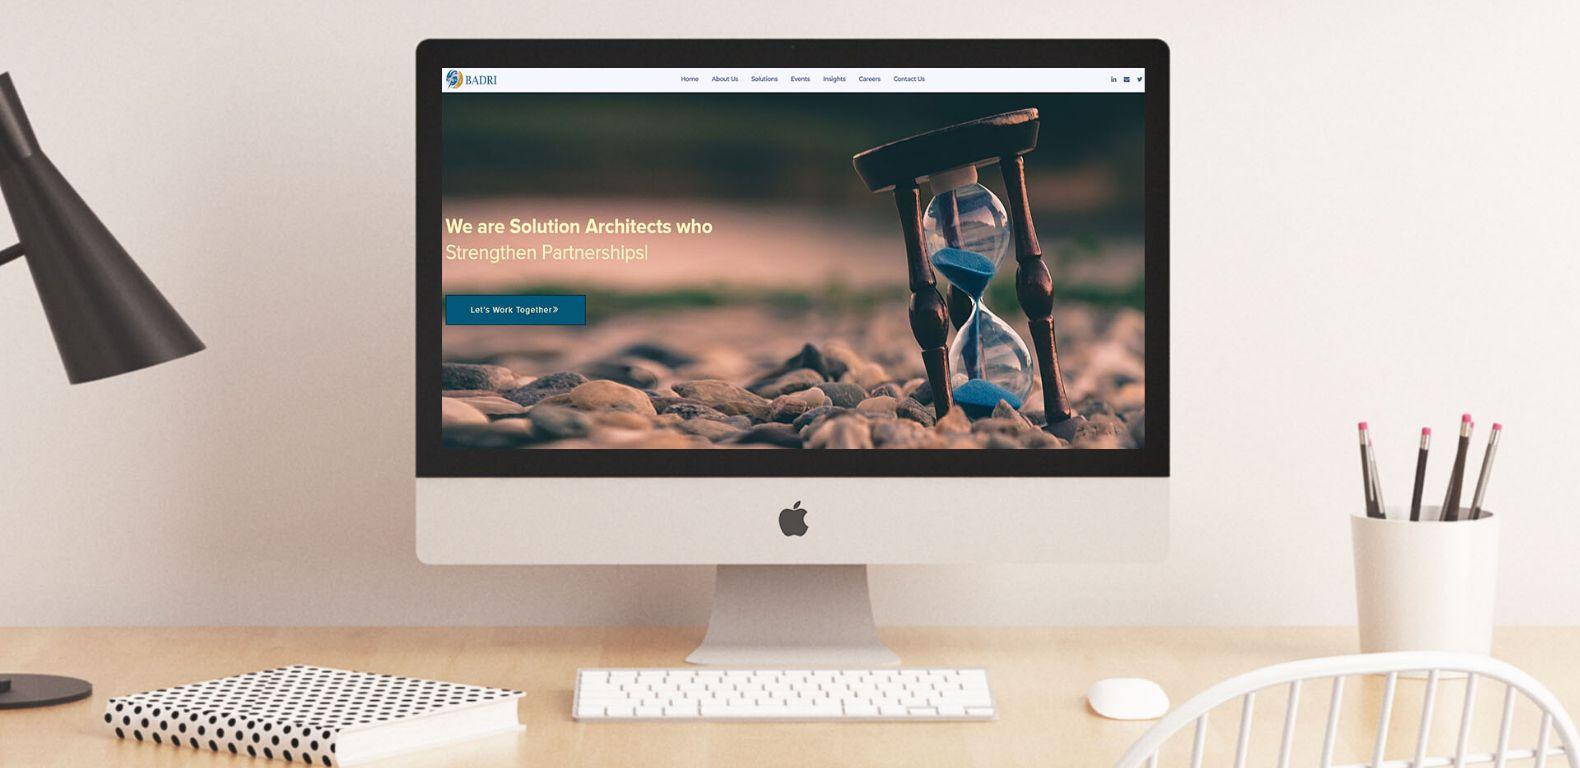 Badri-Consultancy-website-Home-page-design